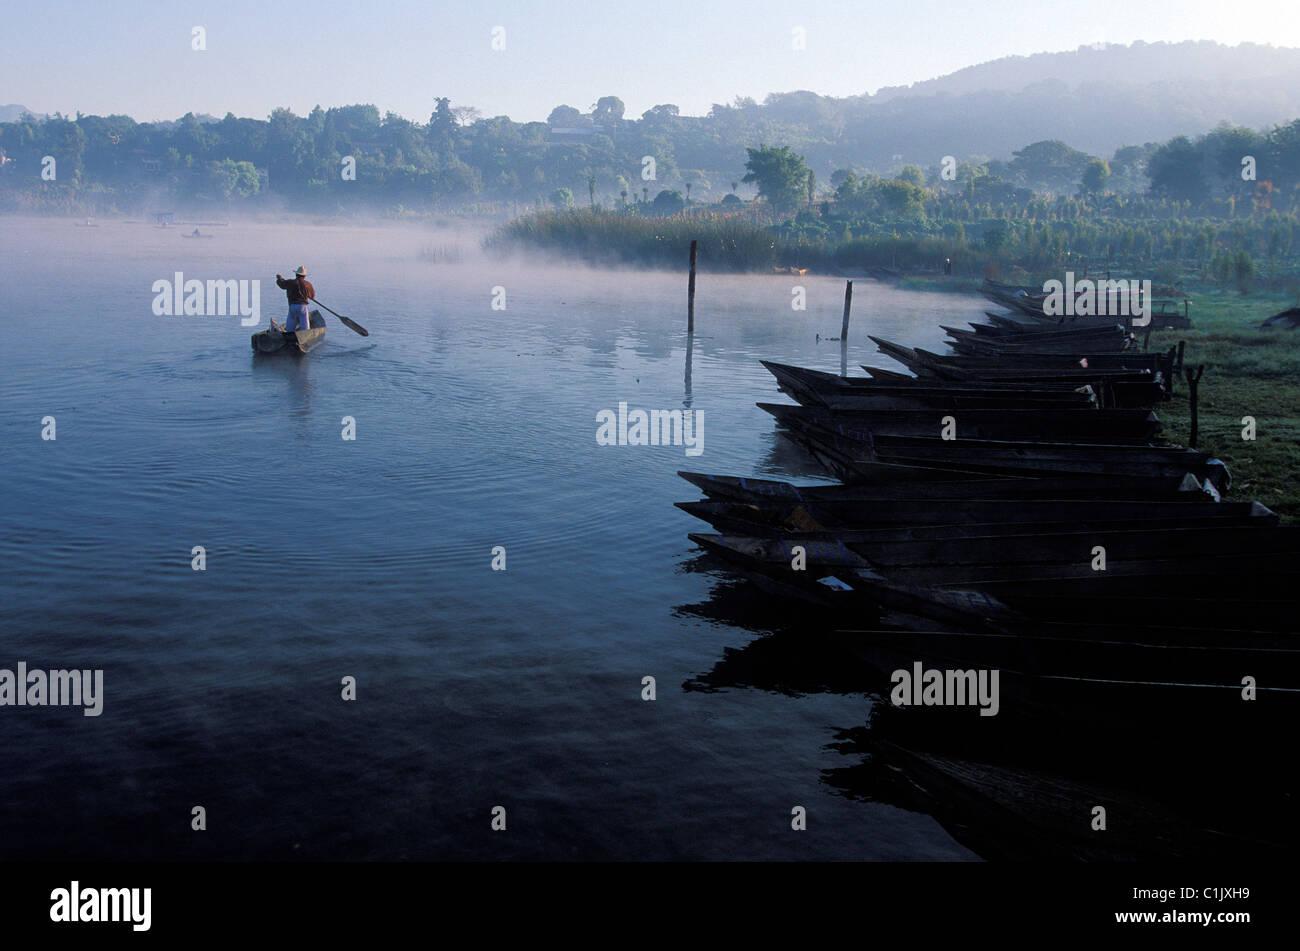 Guatemala, Solola Department, Atitlan Lake area, Santiago Atitlan - Stock Image